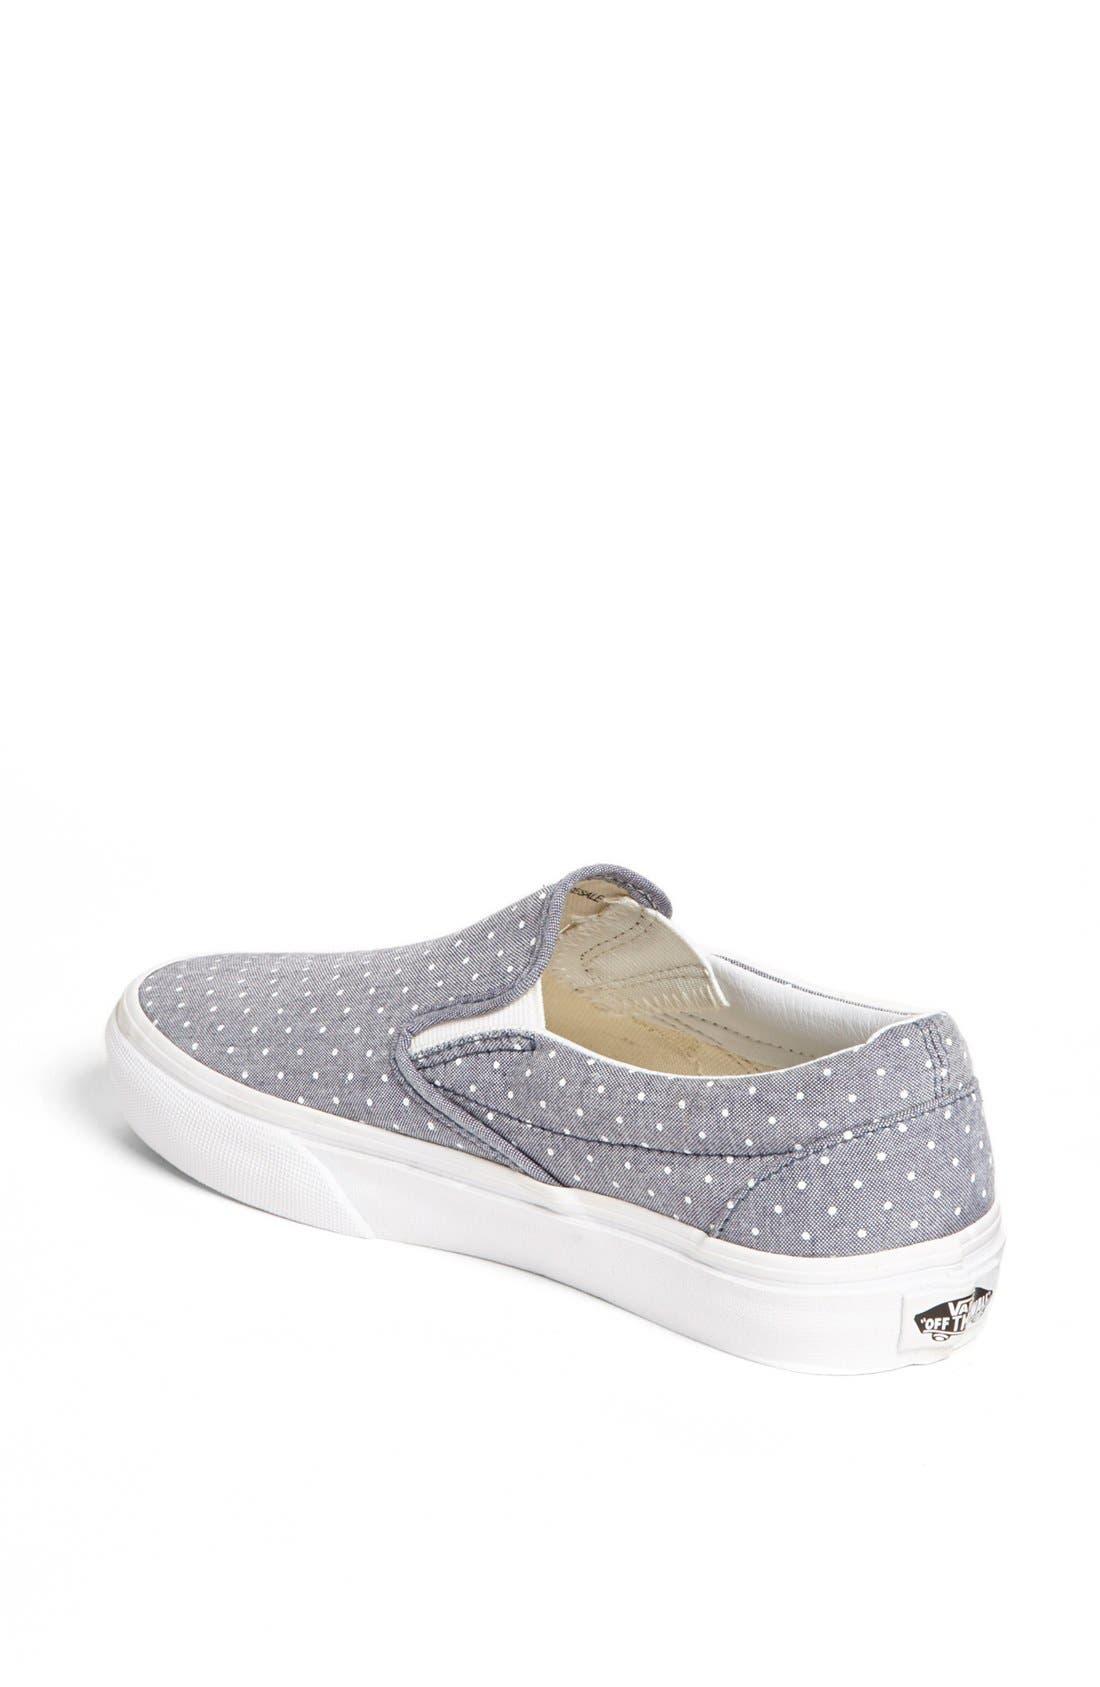 Alternate Image 2  - Vans 'Classic' Sneaker (Women)